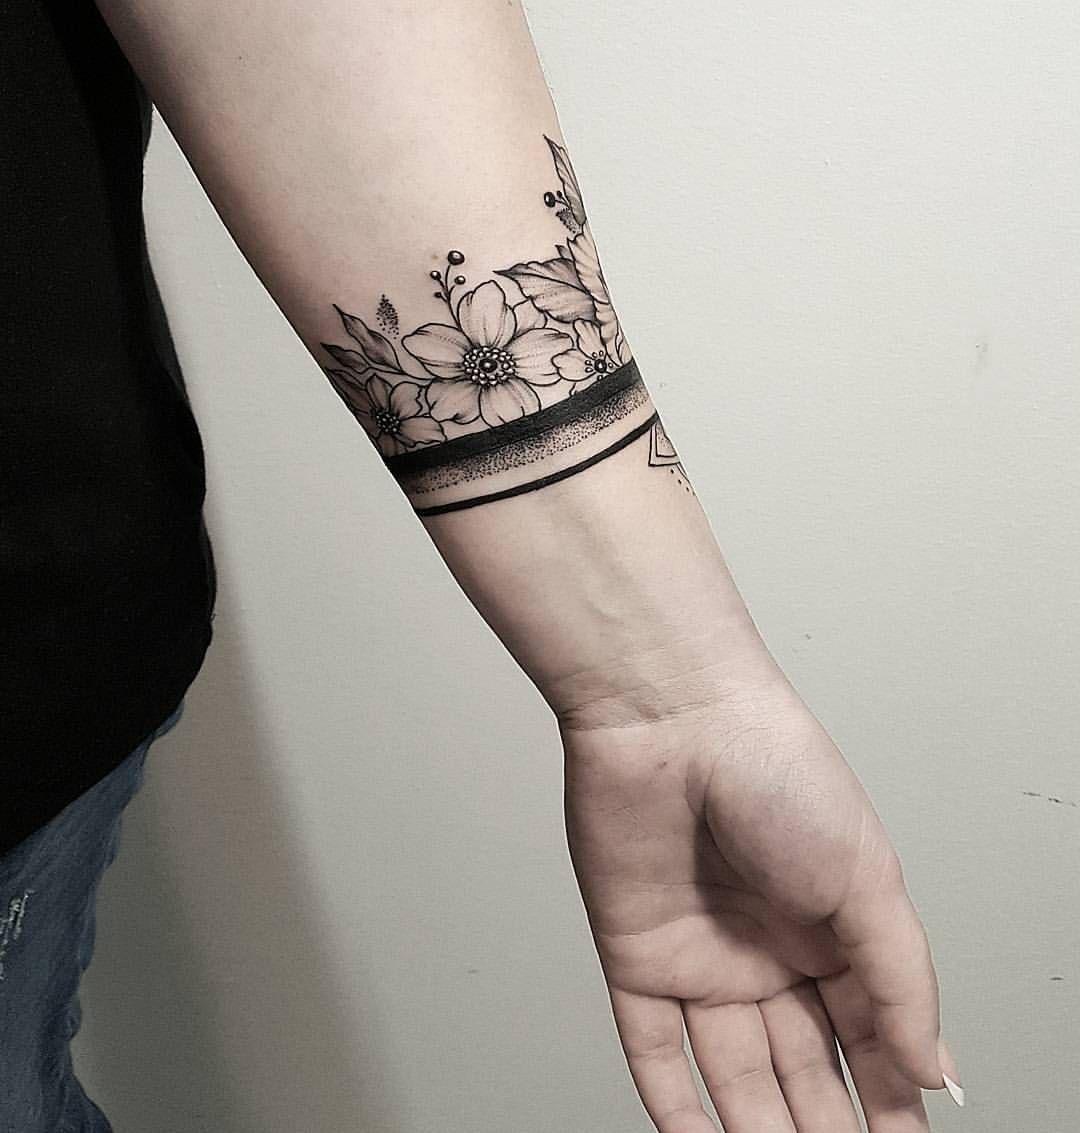 Mandala Peony Dekuju Moc Za Statecnost Wrap Around Wrist Tattoos Cuff Tattoo Wrist Band Tattoo